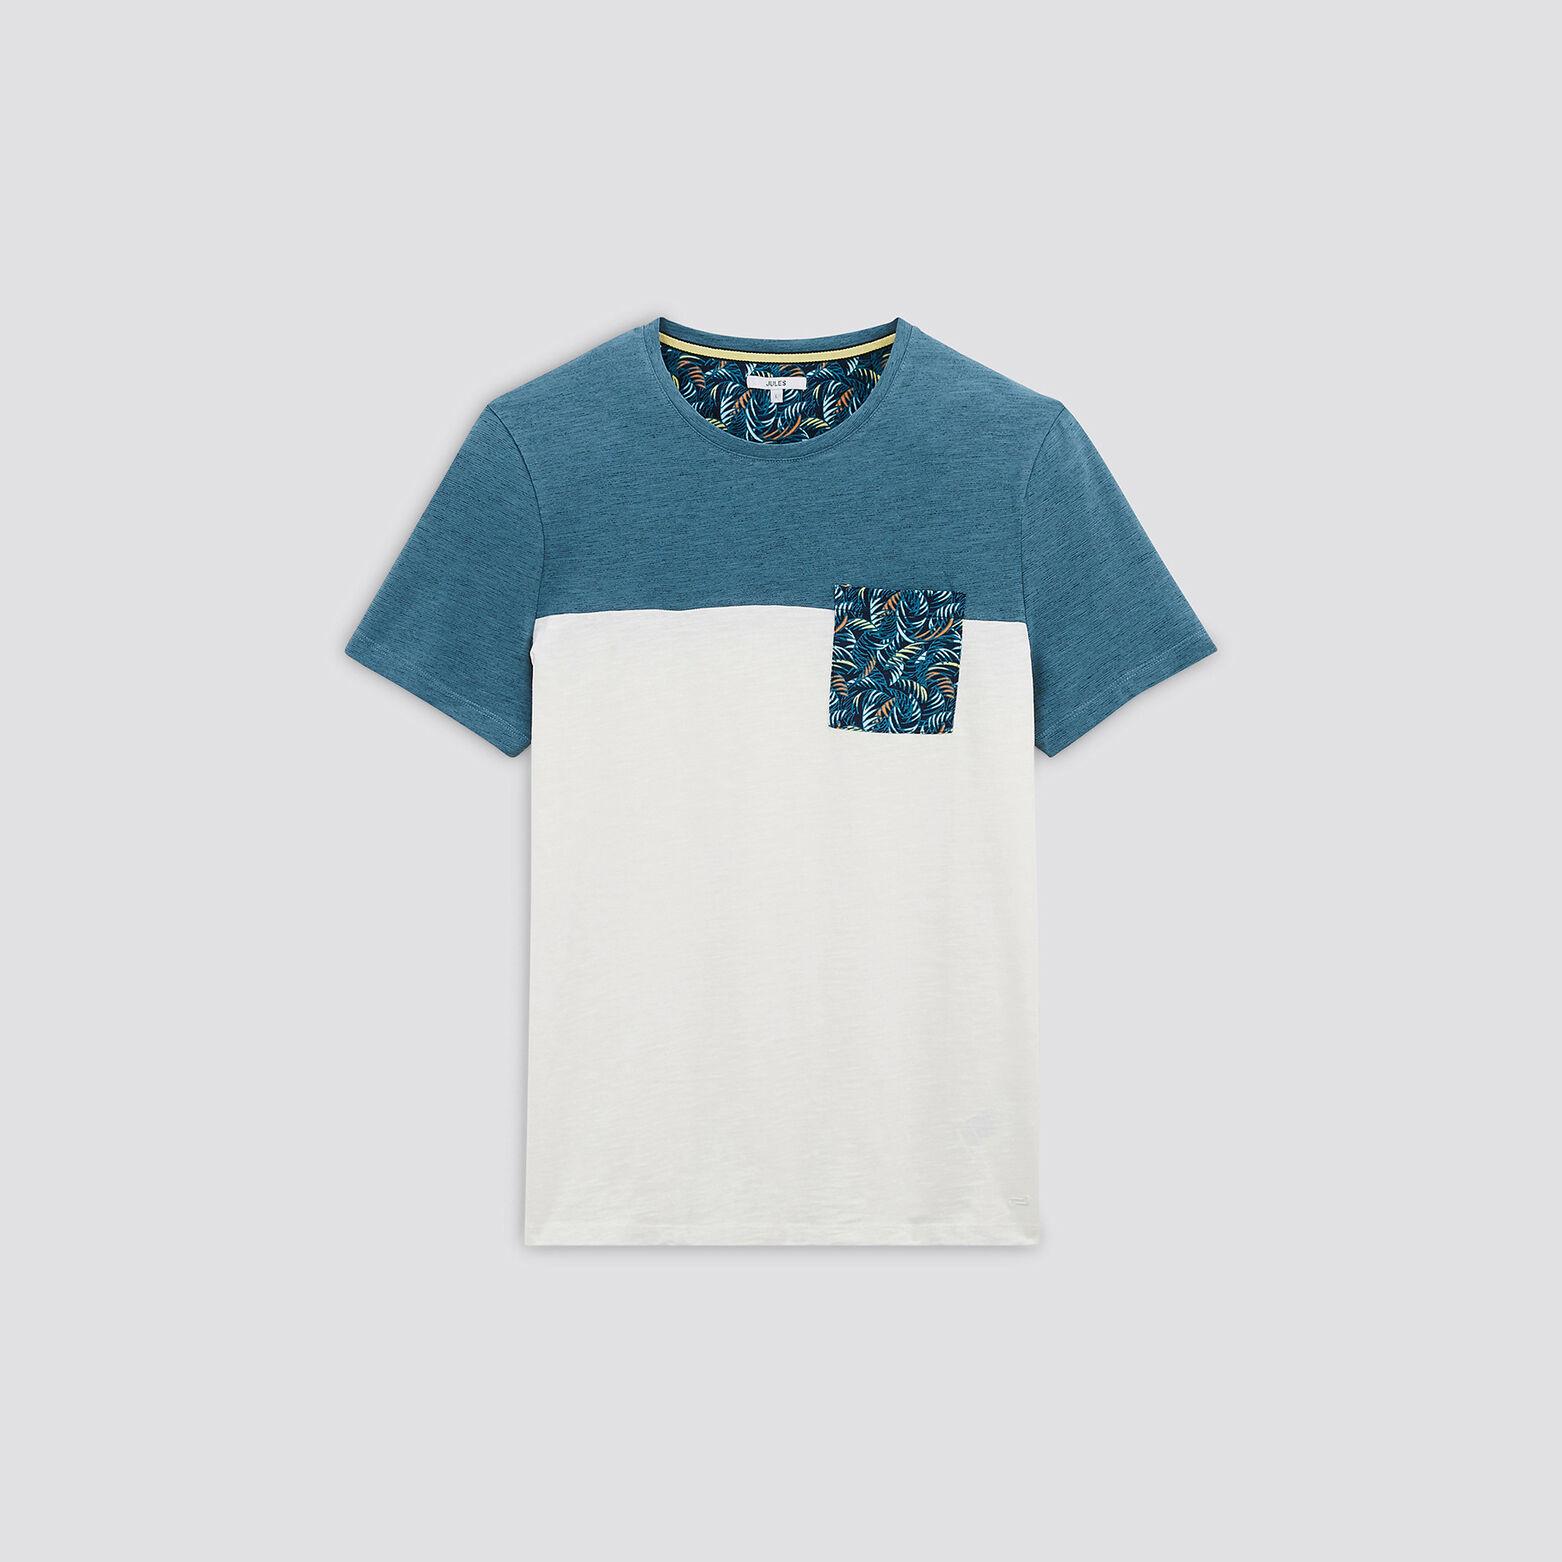 Tee-shirt colorblock poche imprimée coton issu de